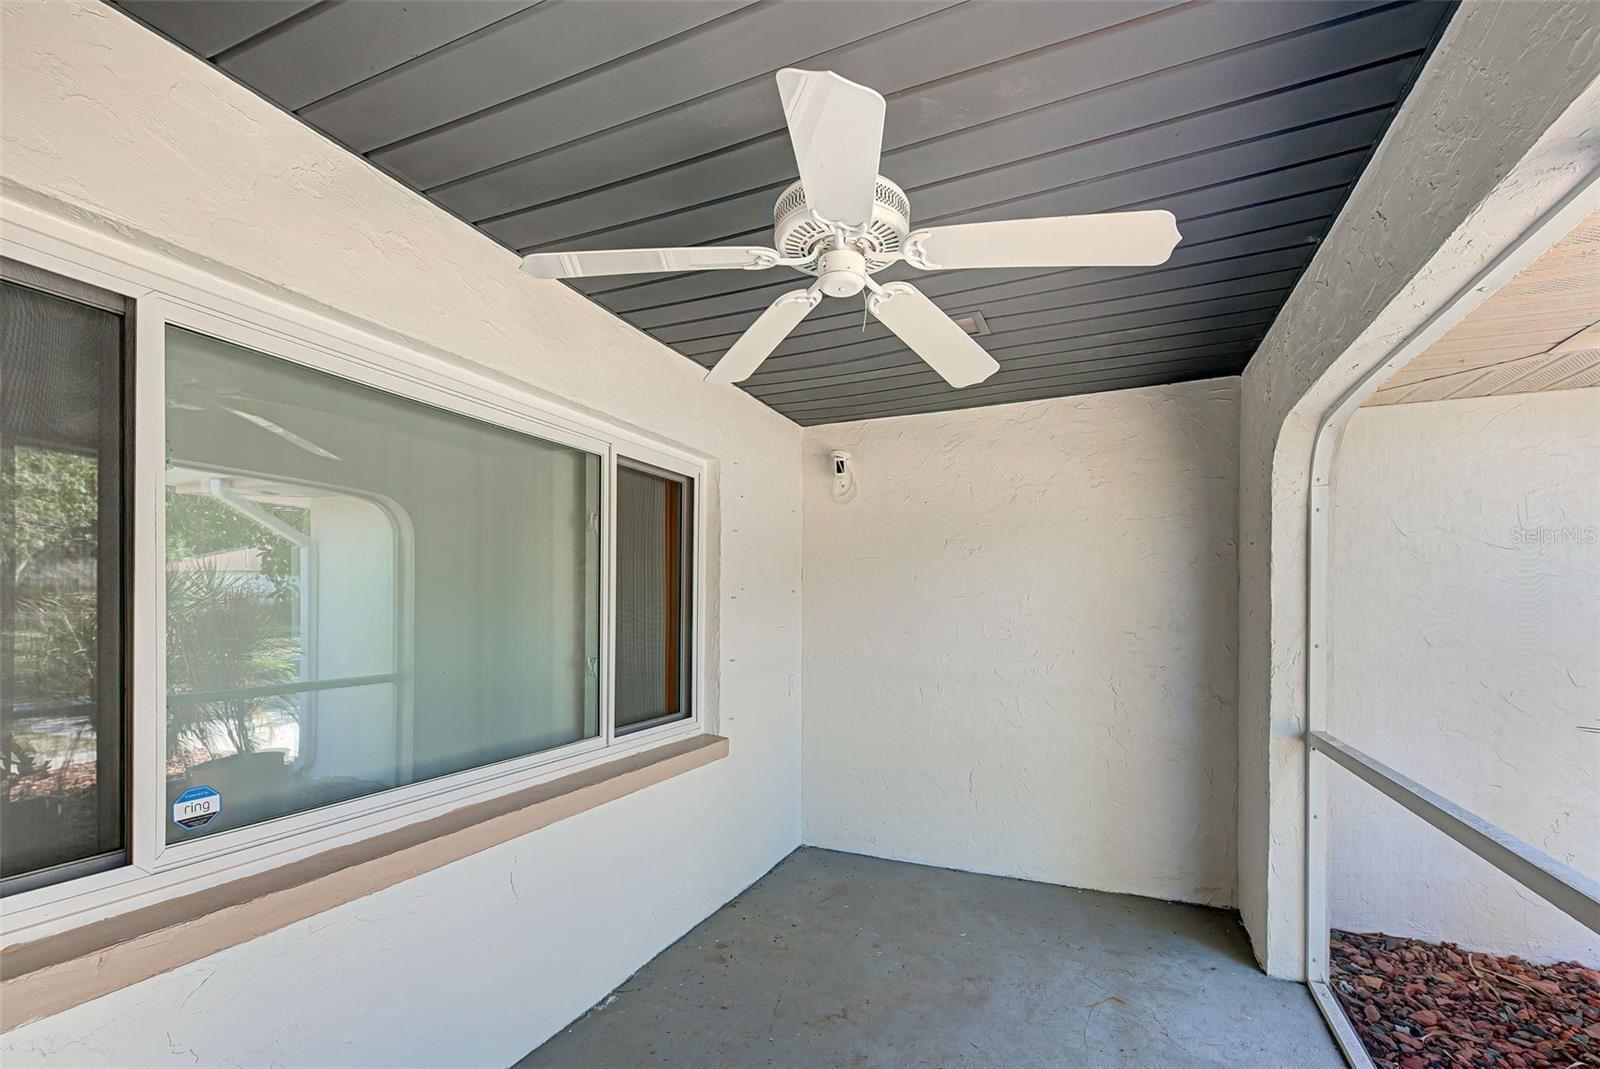 Photo of 392 HARVARD ROAD, VENICE, FL 34293 (MLS # D6119389)